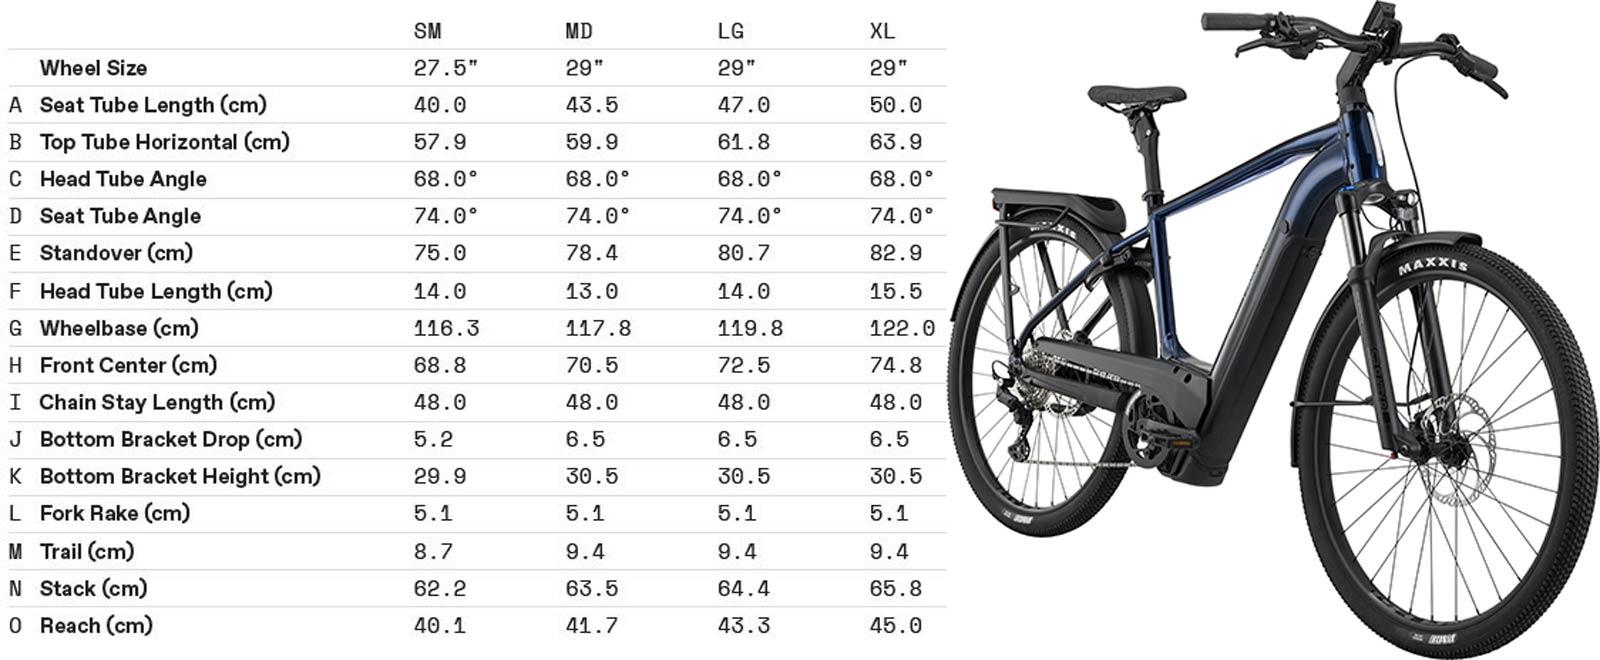 The 2022 Cannondale Tesoro Neo X standard frame Geometry Chart